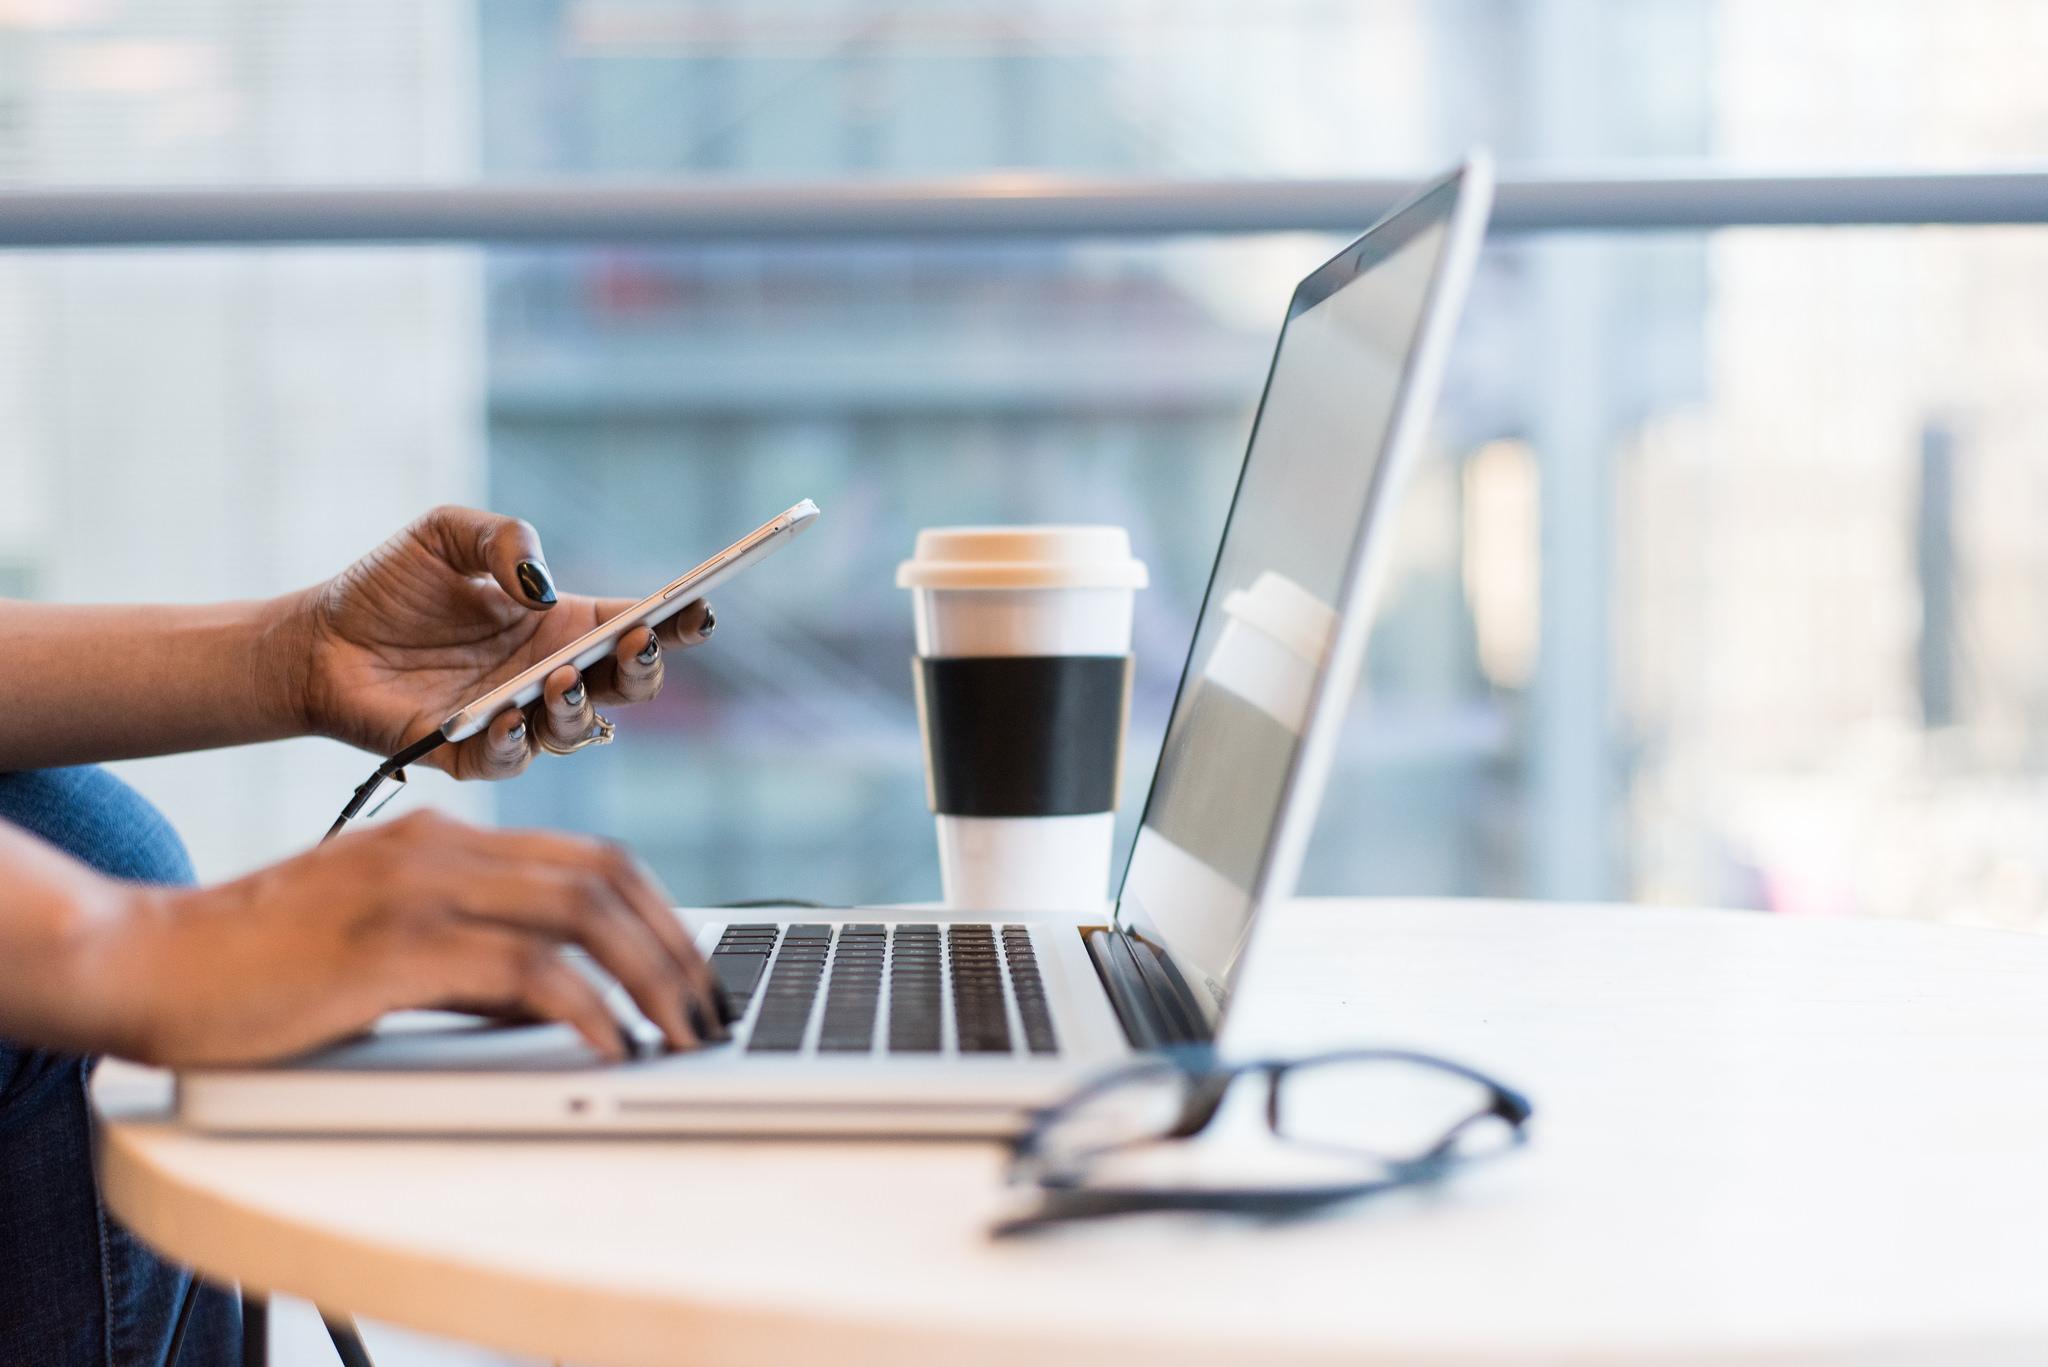 Black woman working at Macbook computer